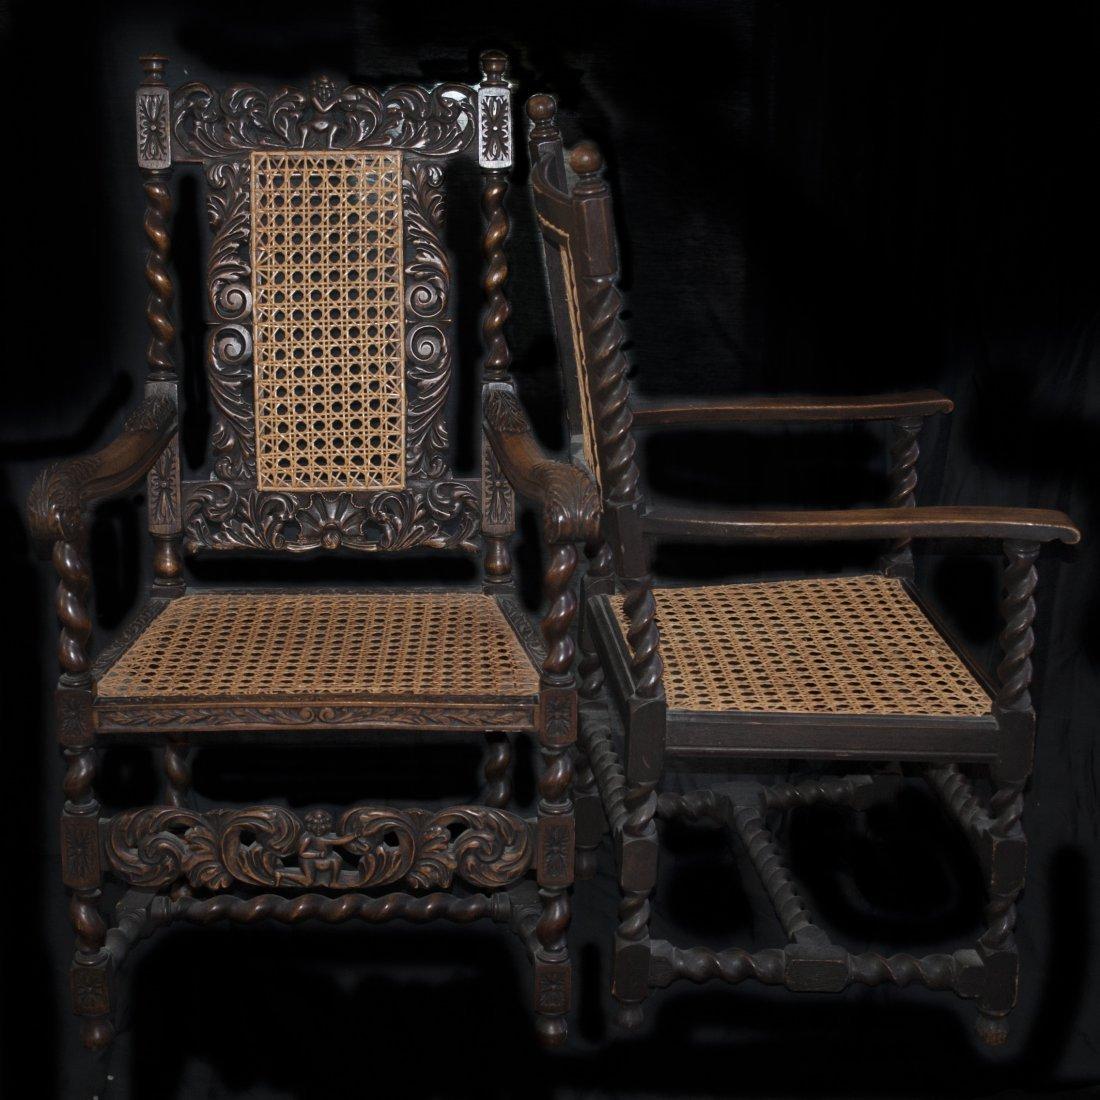 Pair of Wicker & Wood Armchairs